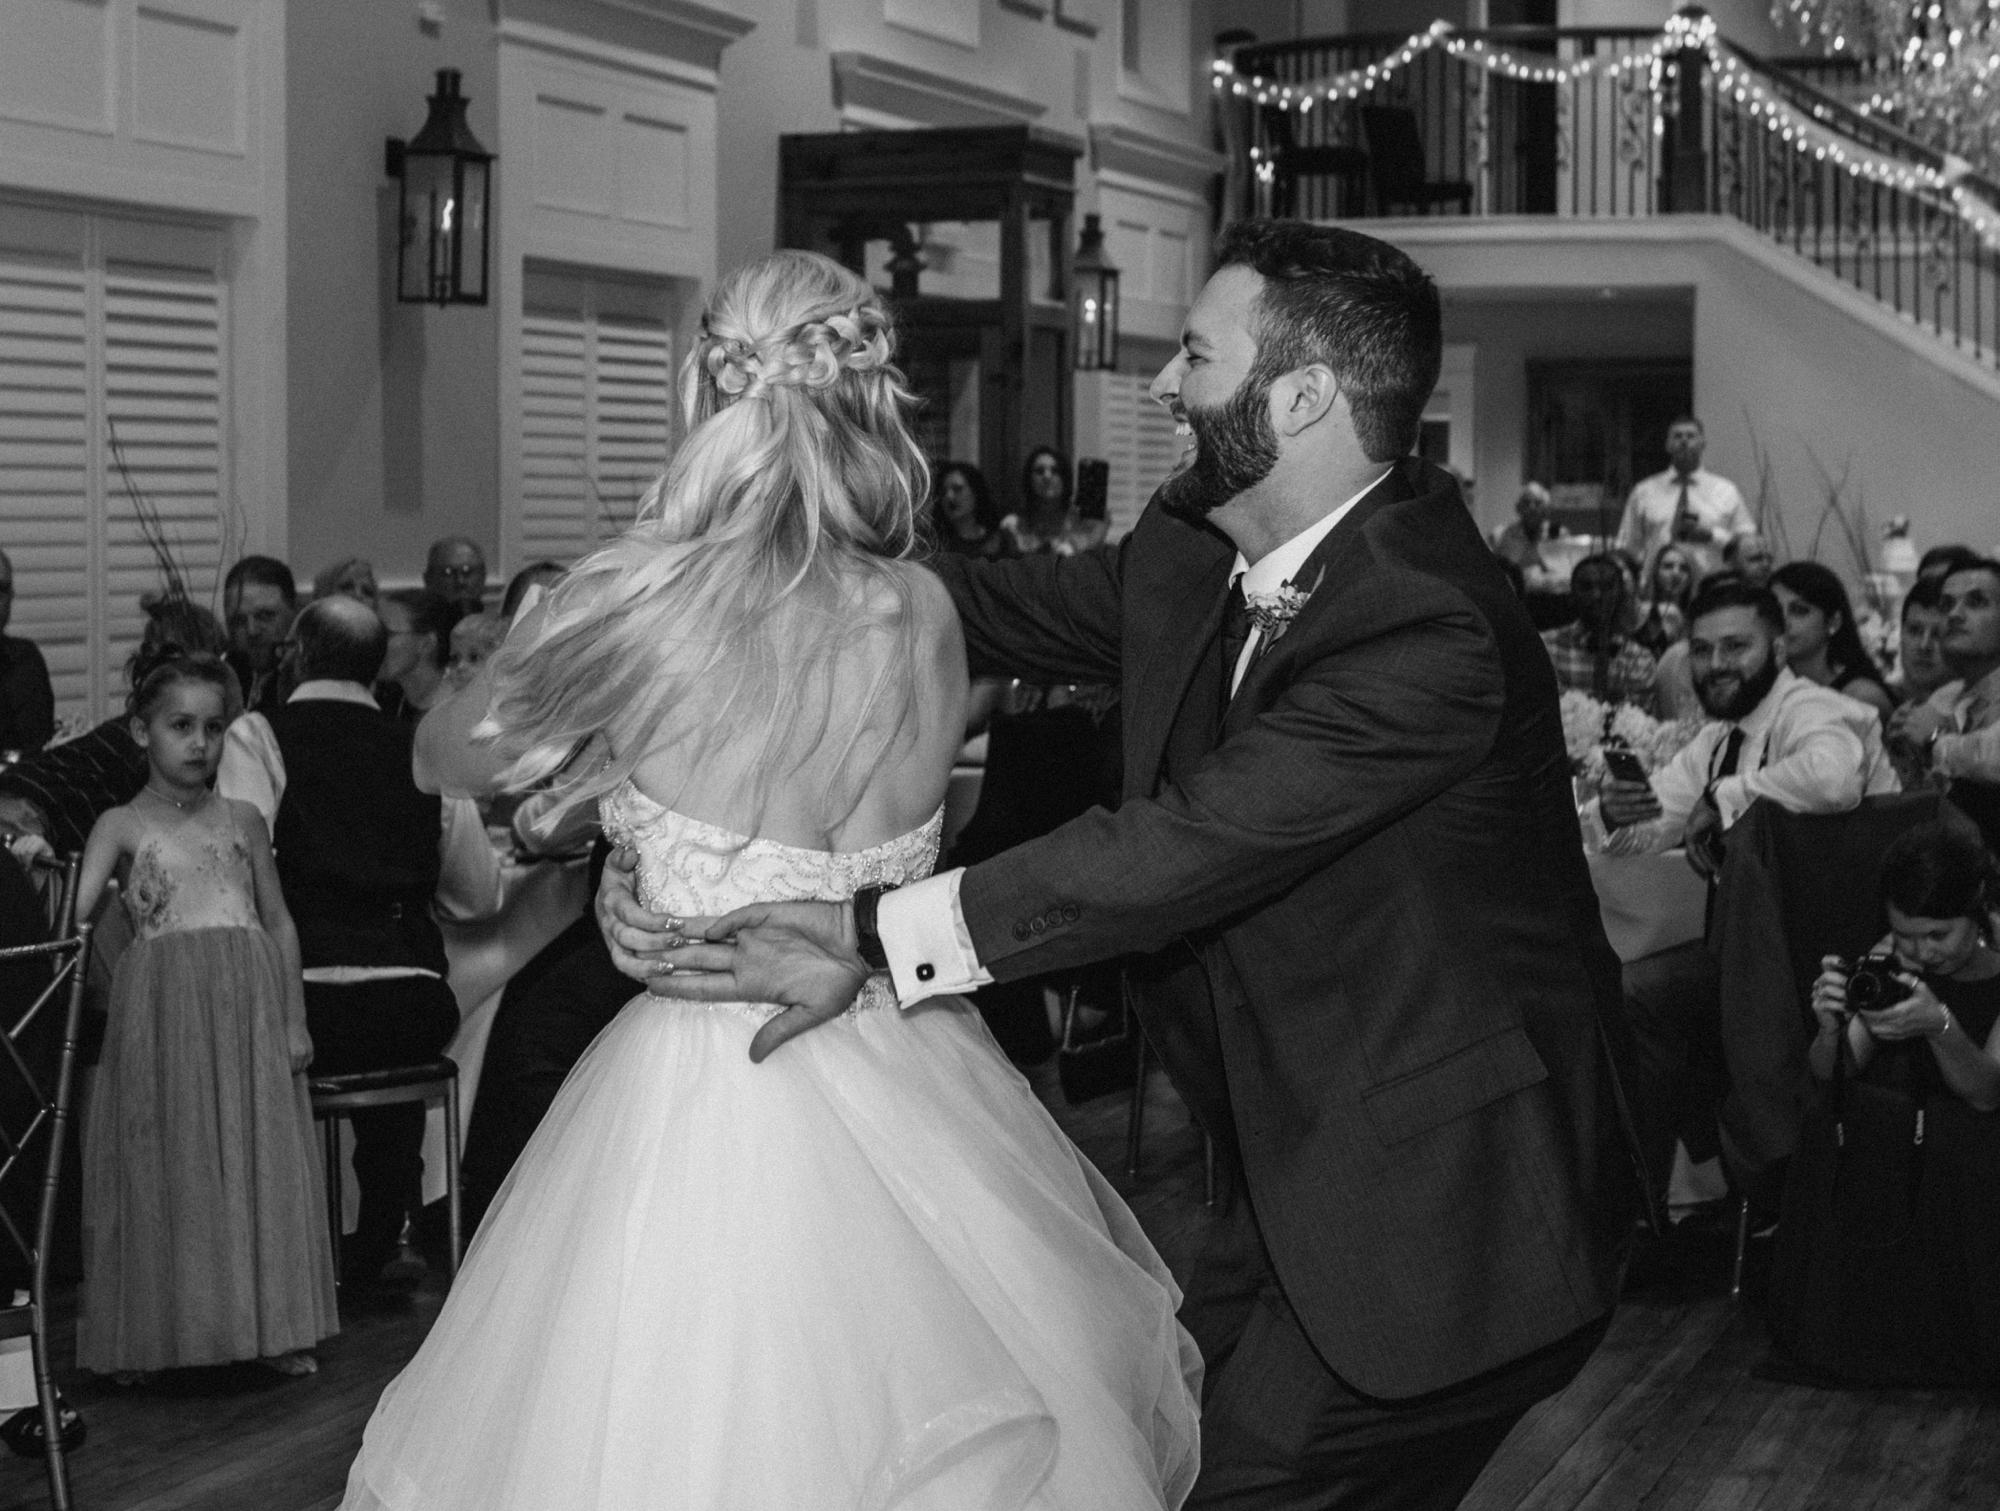 austin-texas-wedding-photography-1778-photographie-21.jpg